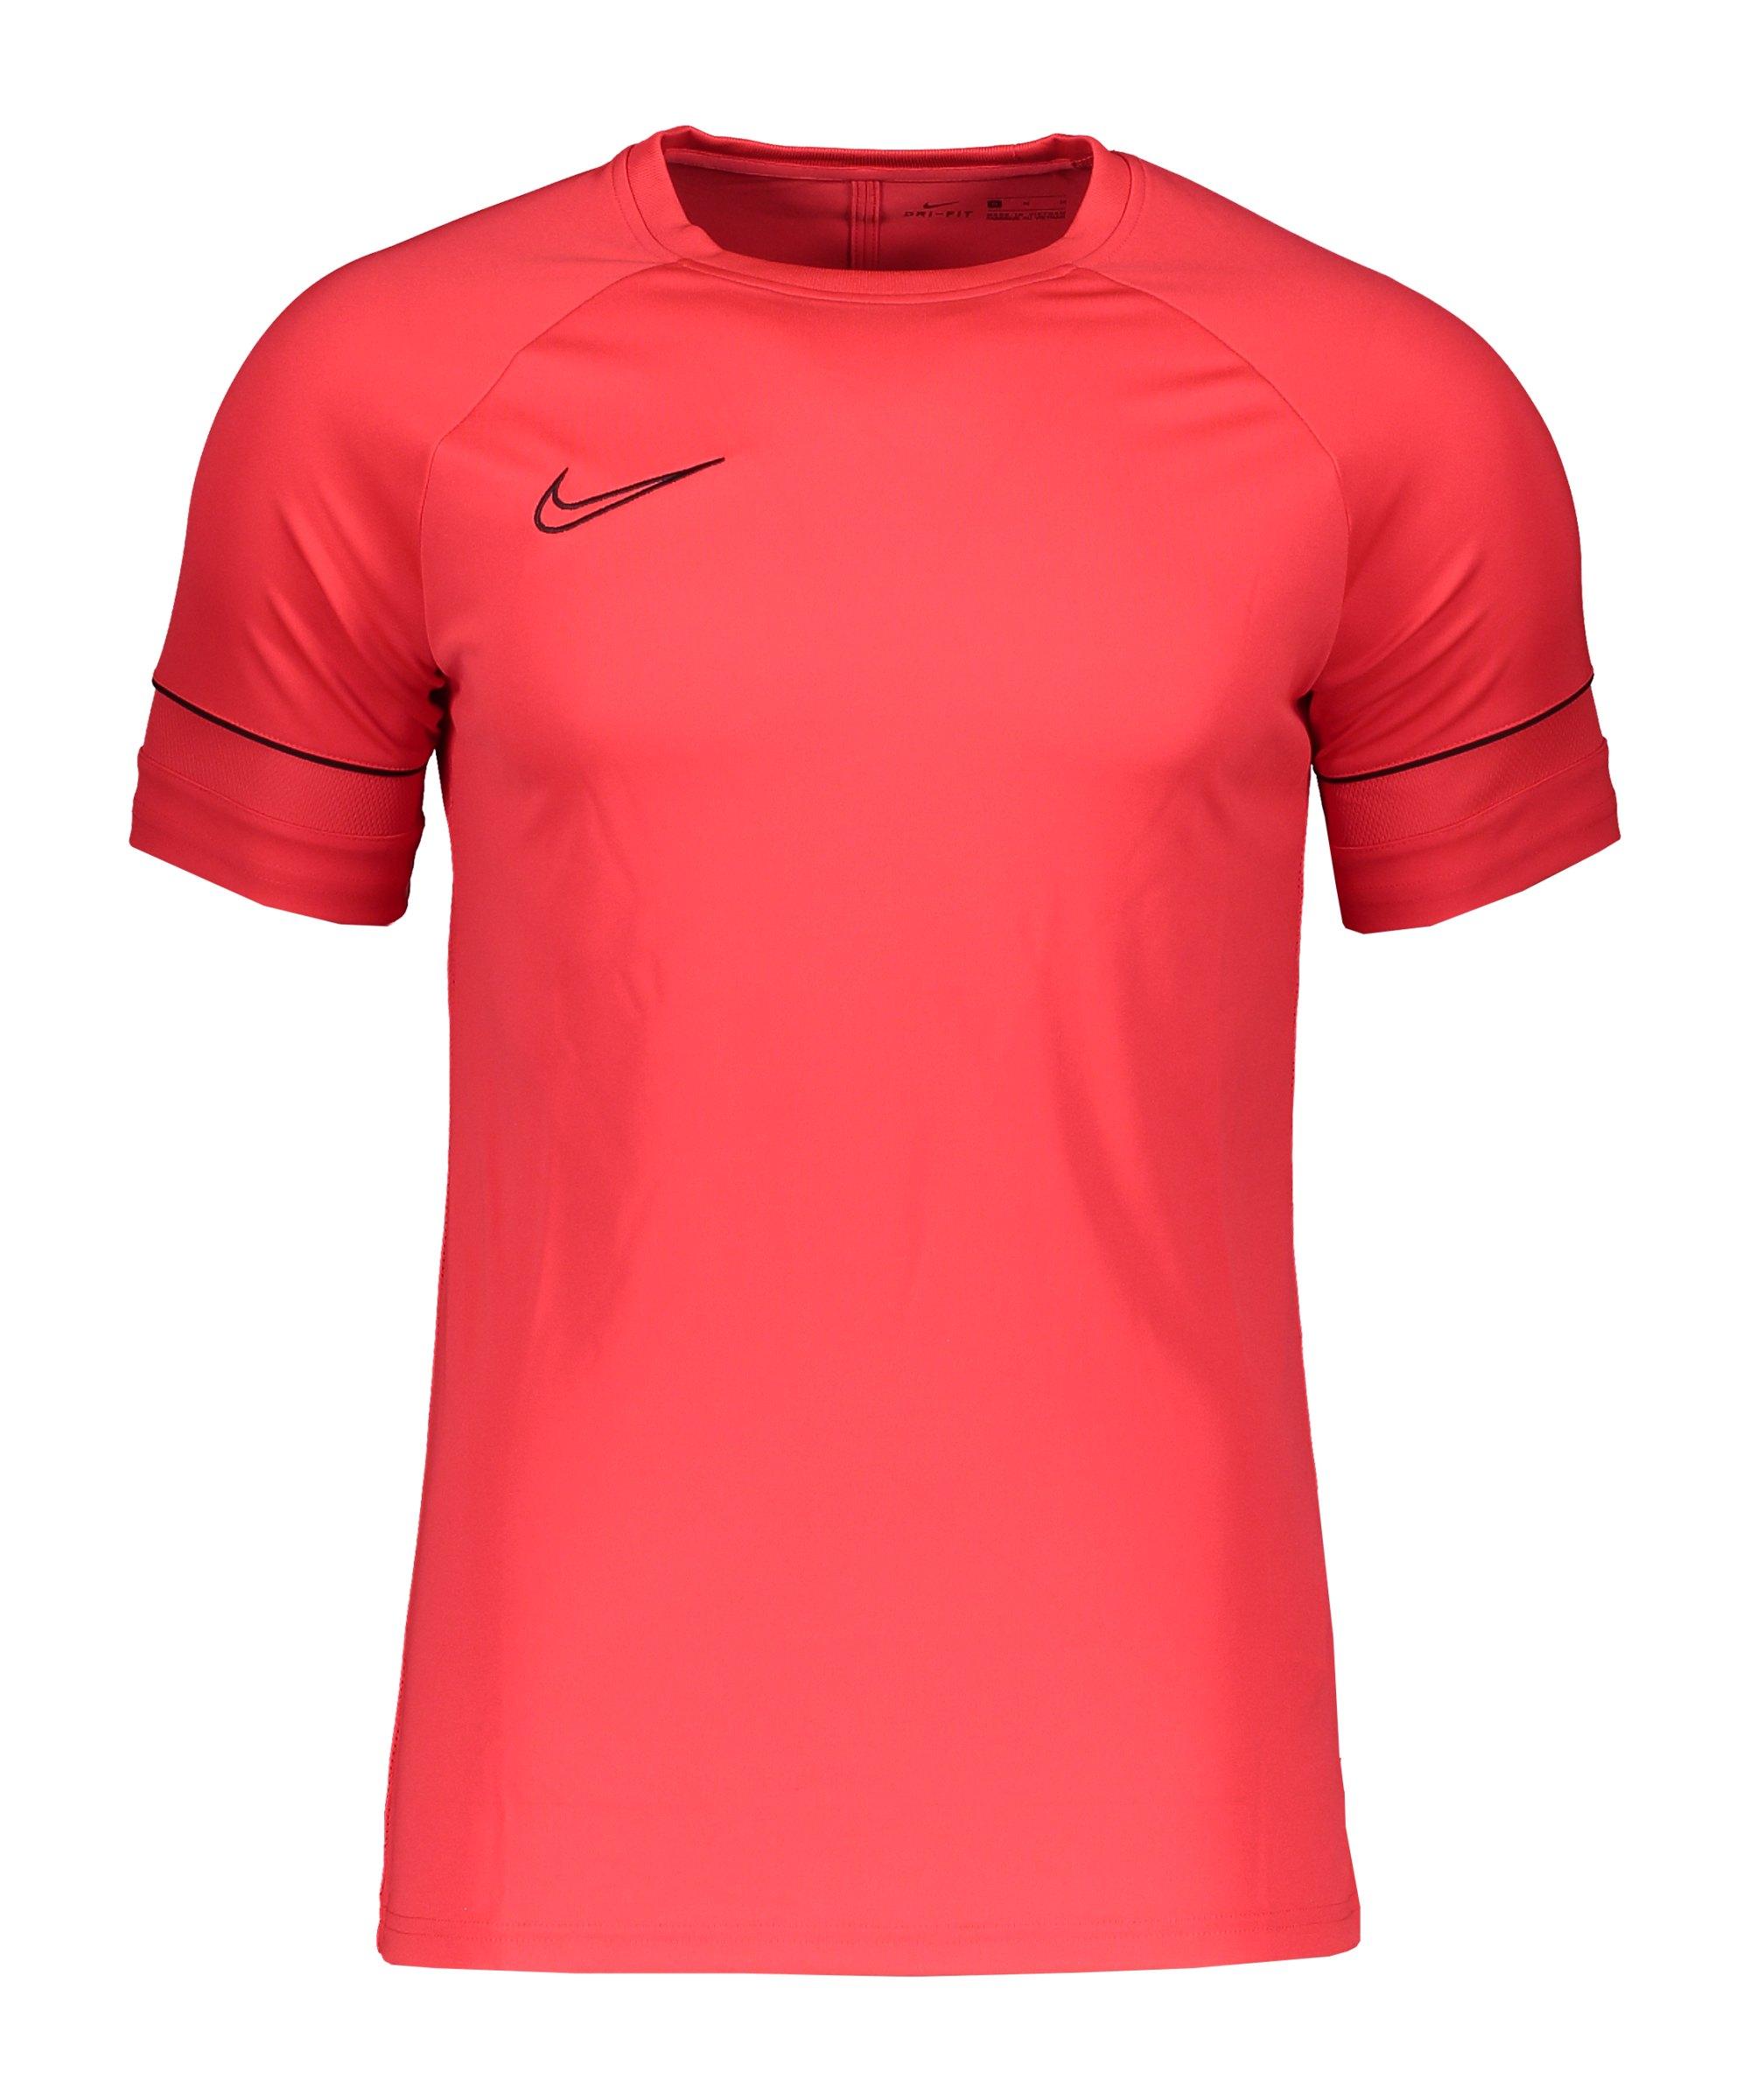 Nike Academy 21 T-Shirt Kids Rot F660 - rot